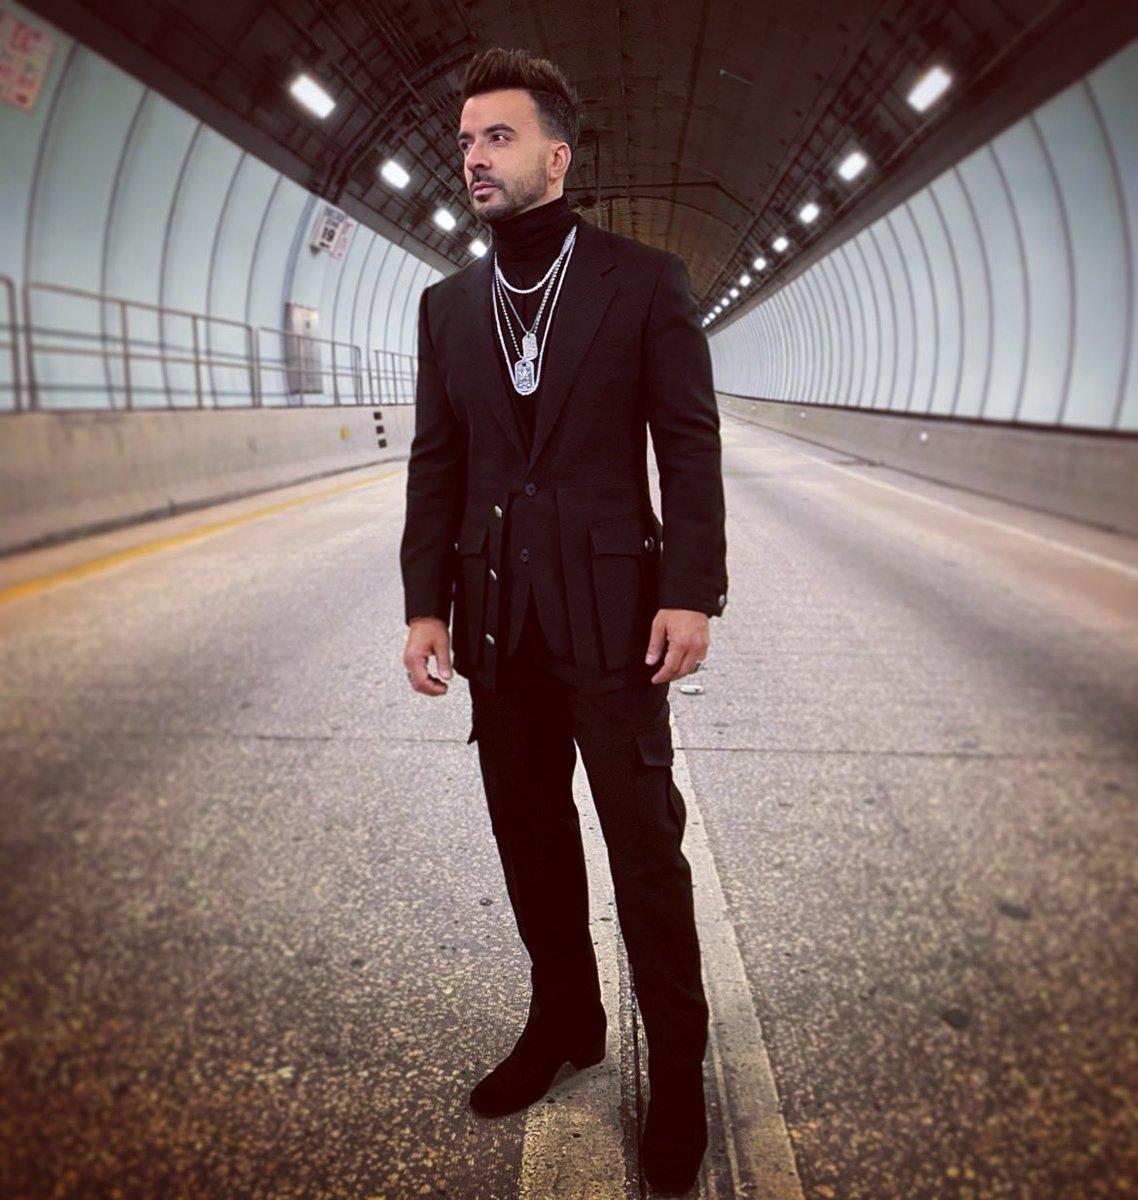 Replying to @LuisFonsi: Tunnel vision #Vacio